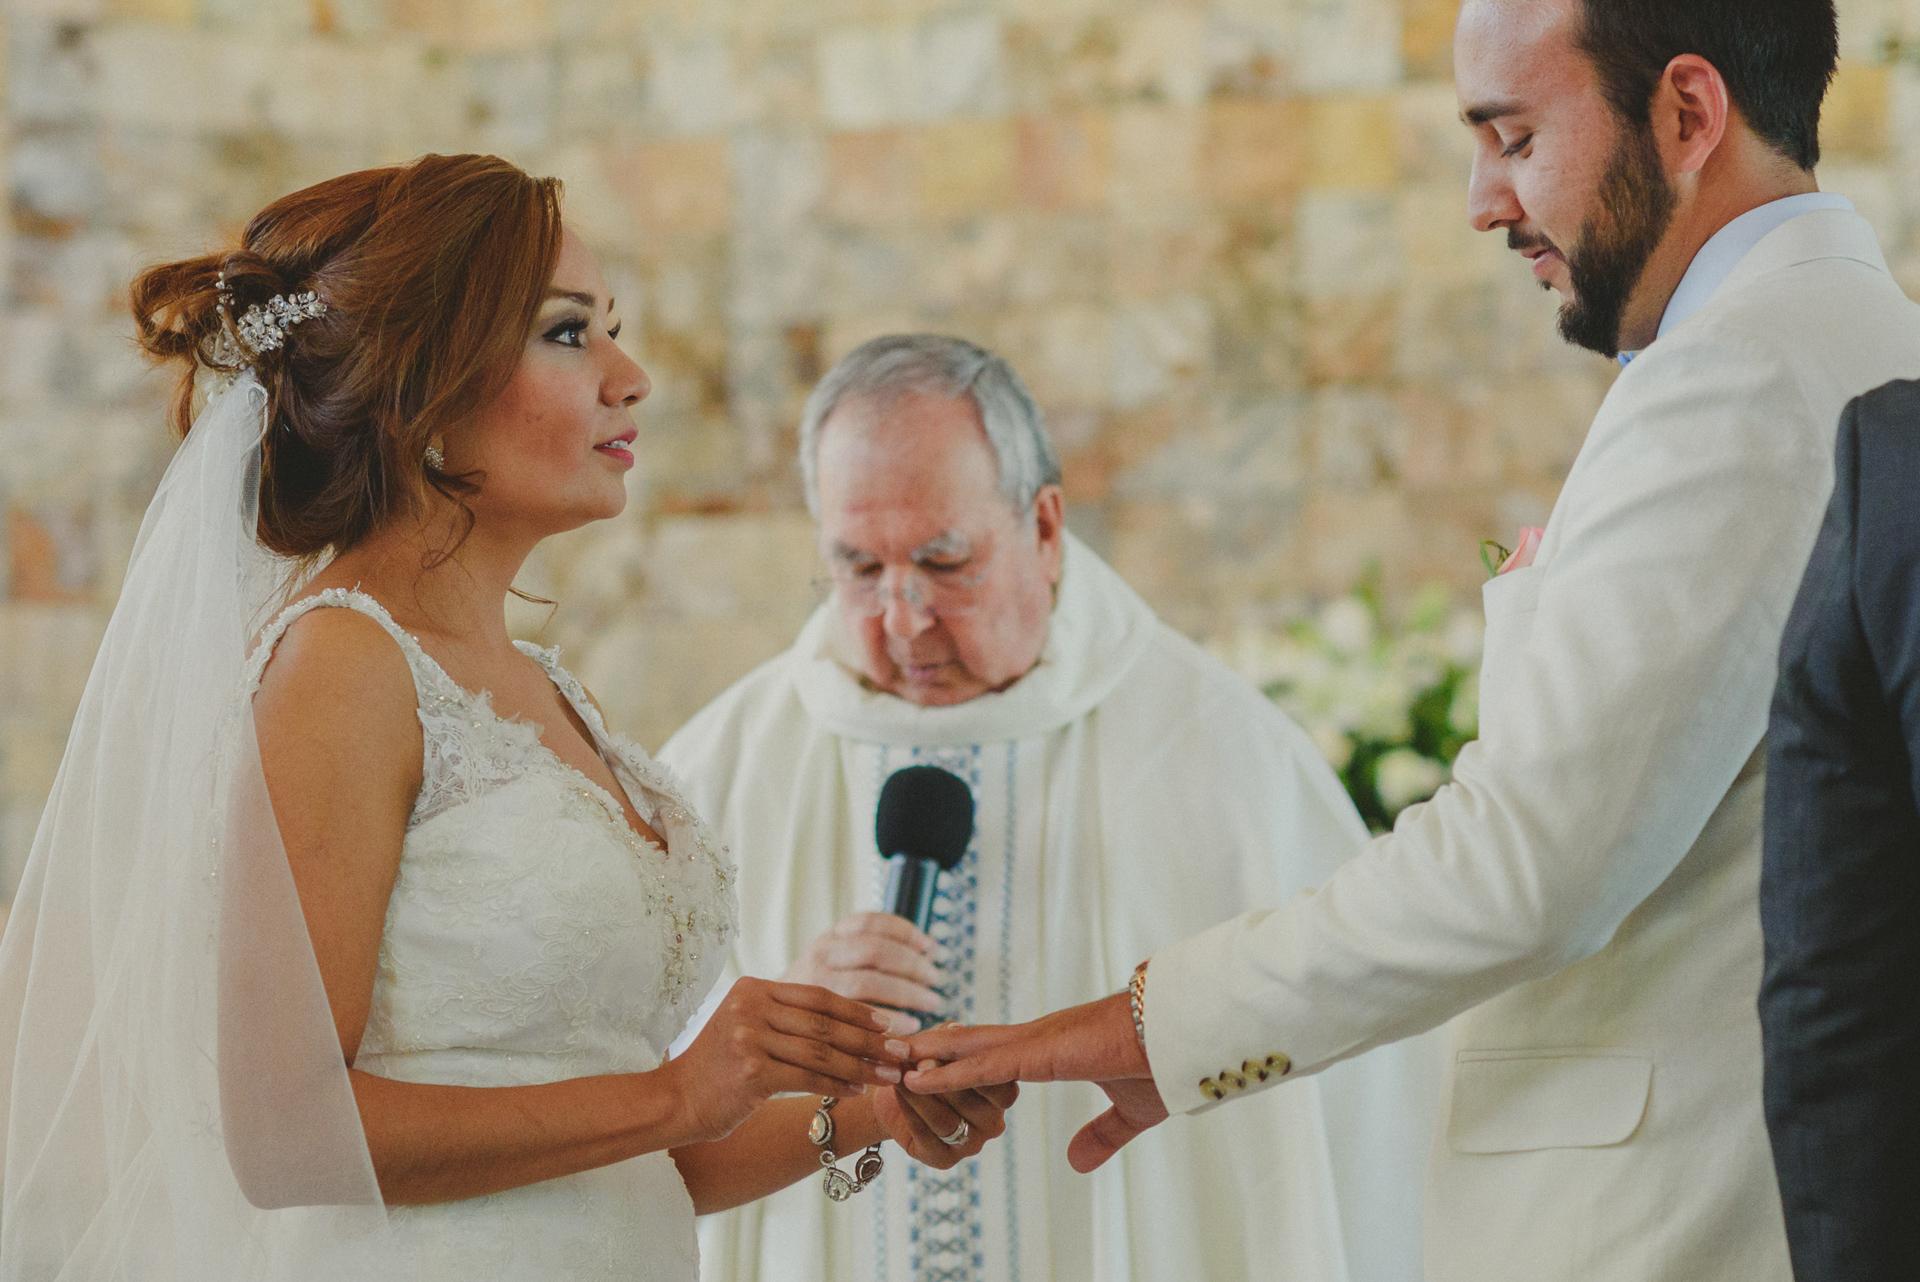 Wedding N&M BLOG luishoudin.com (48 de 174)